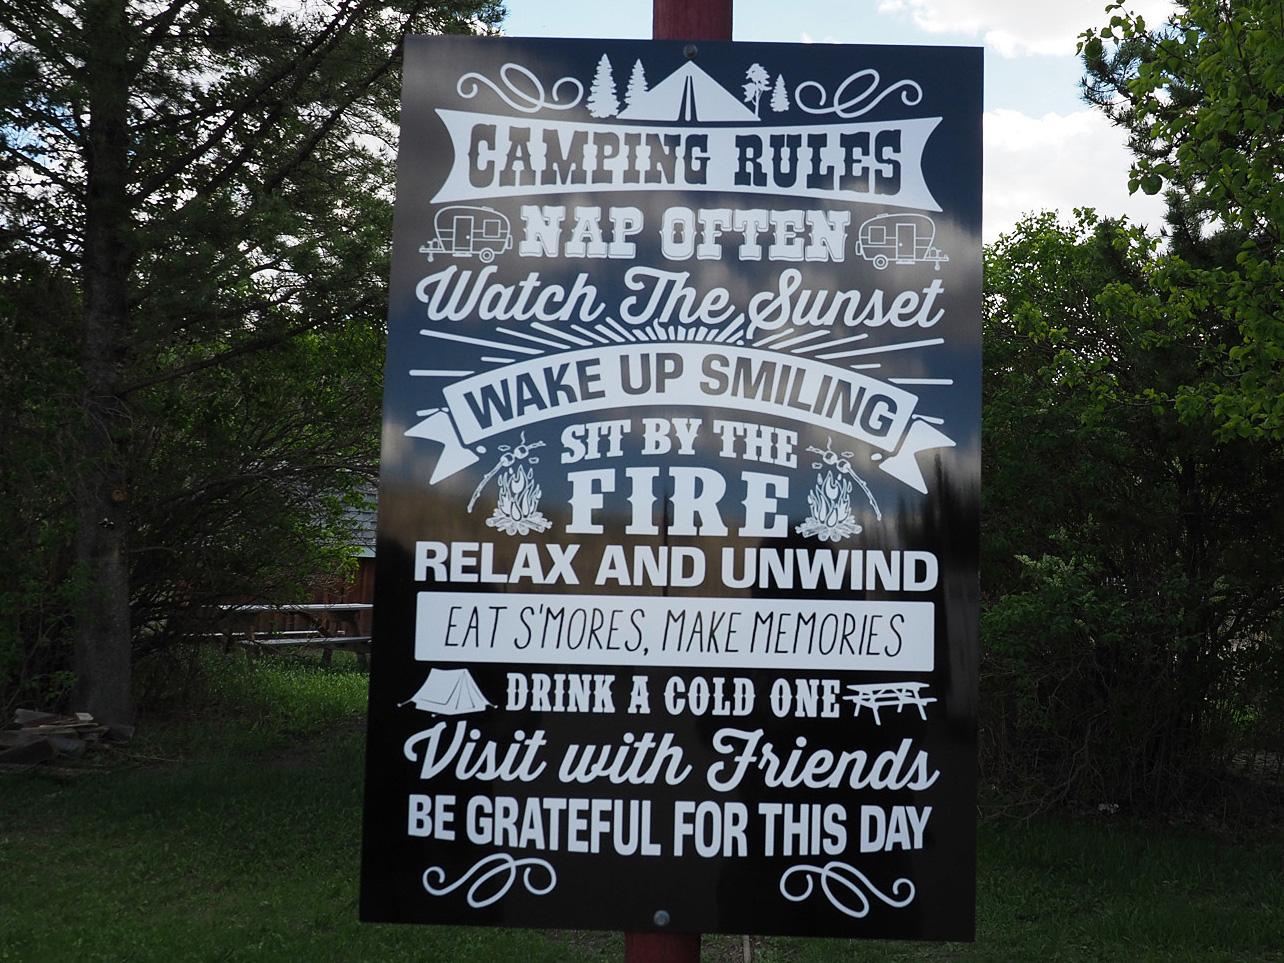 Campingplatzregeln am Last Chance Saloon